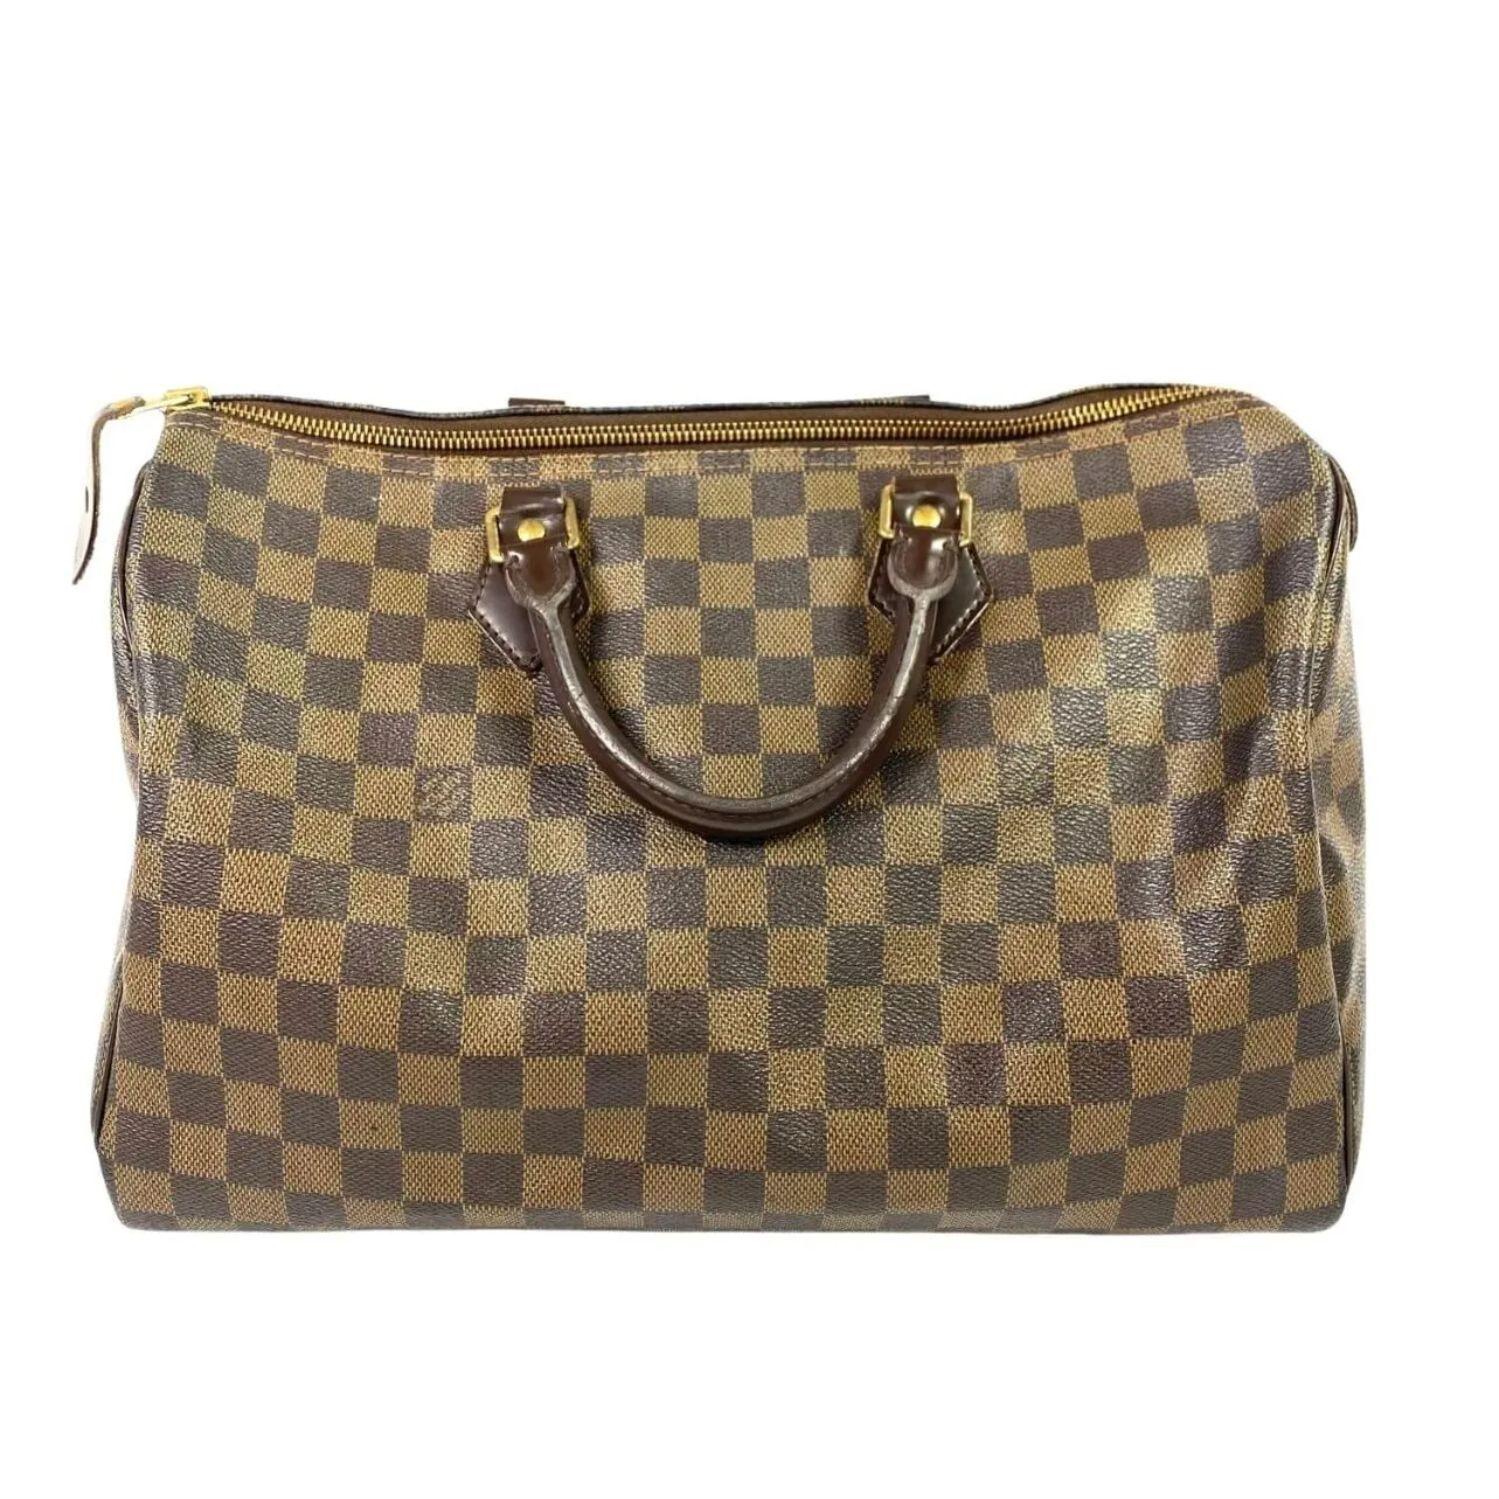 Bolsa Louis Vuitton Speedy 35 Damier Ebene